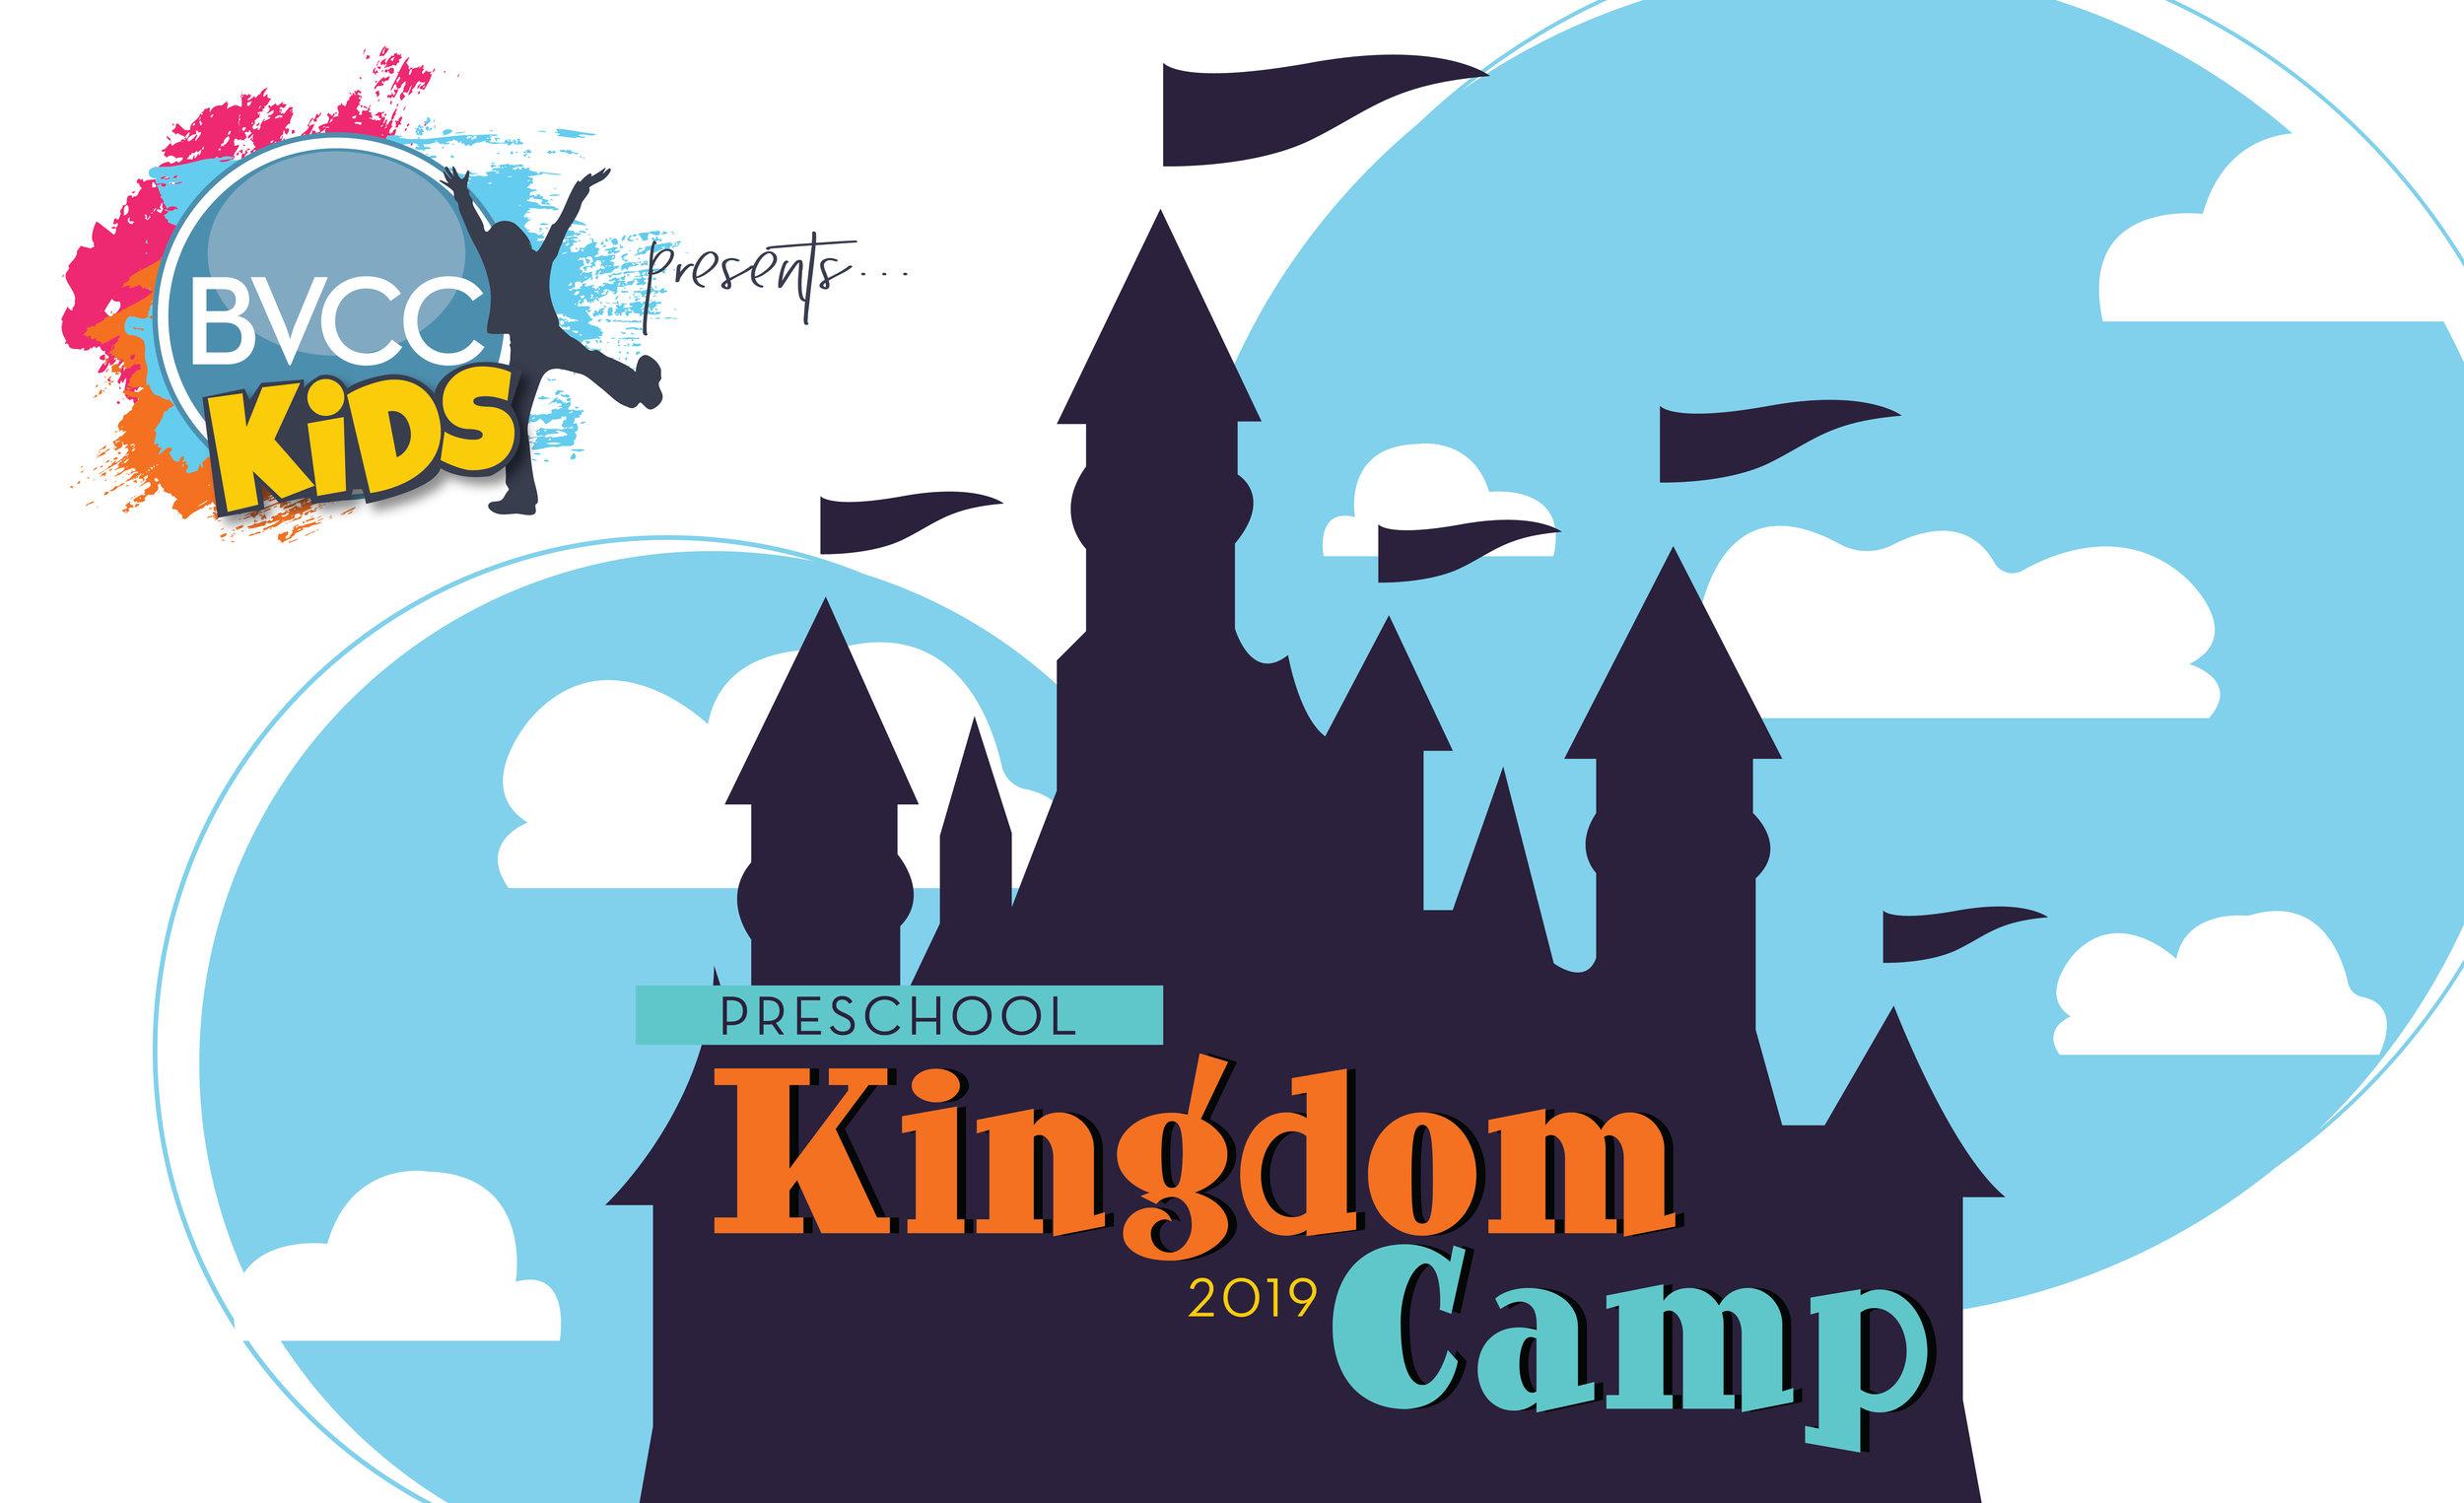 Preschool-kingdom-camp-01.jpg